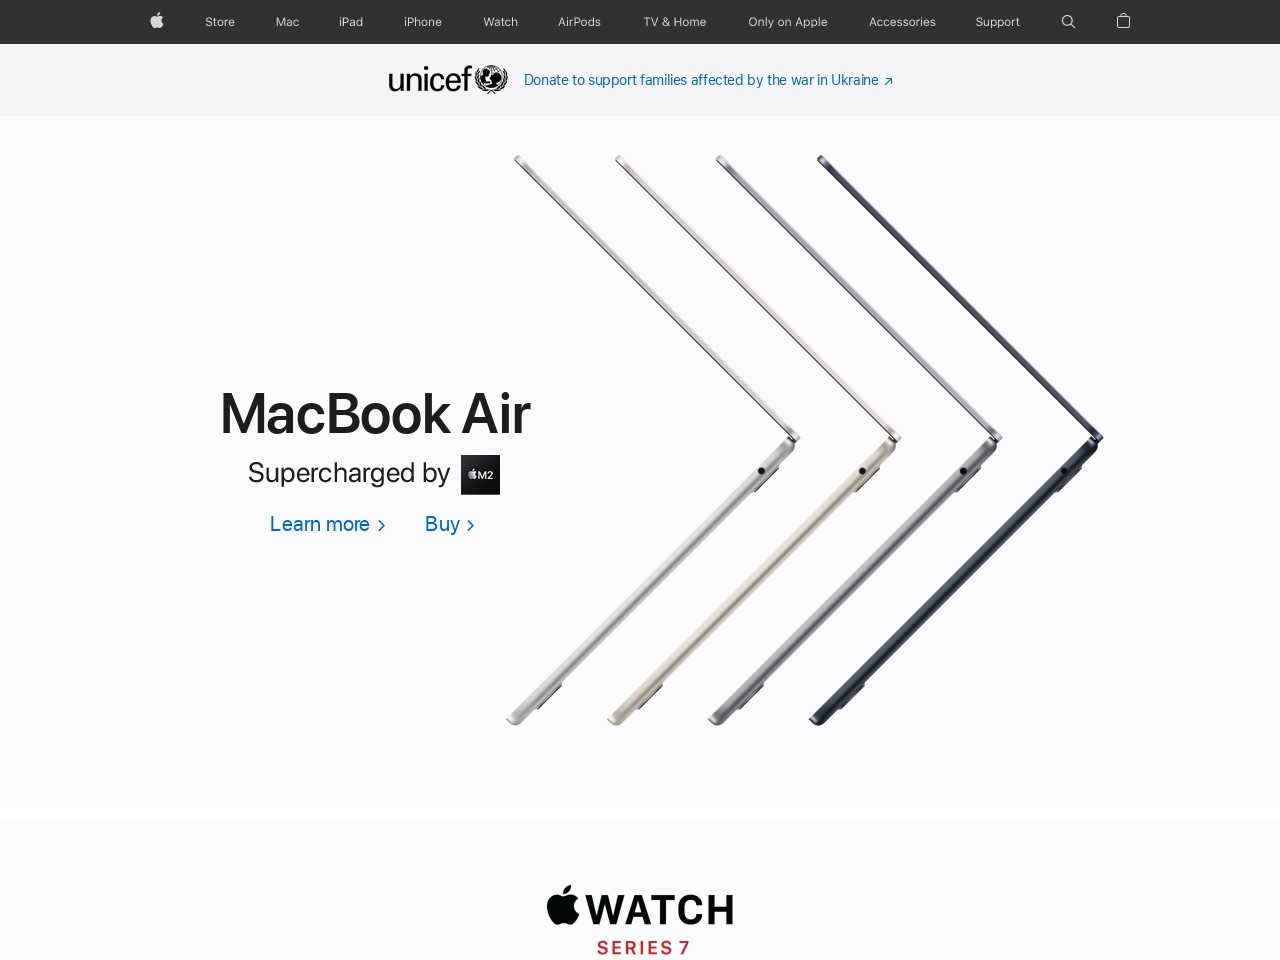 https://www.apple.com/jp/support/iphone/repair/battery-power/